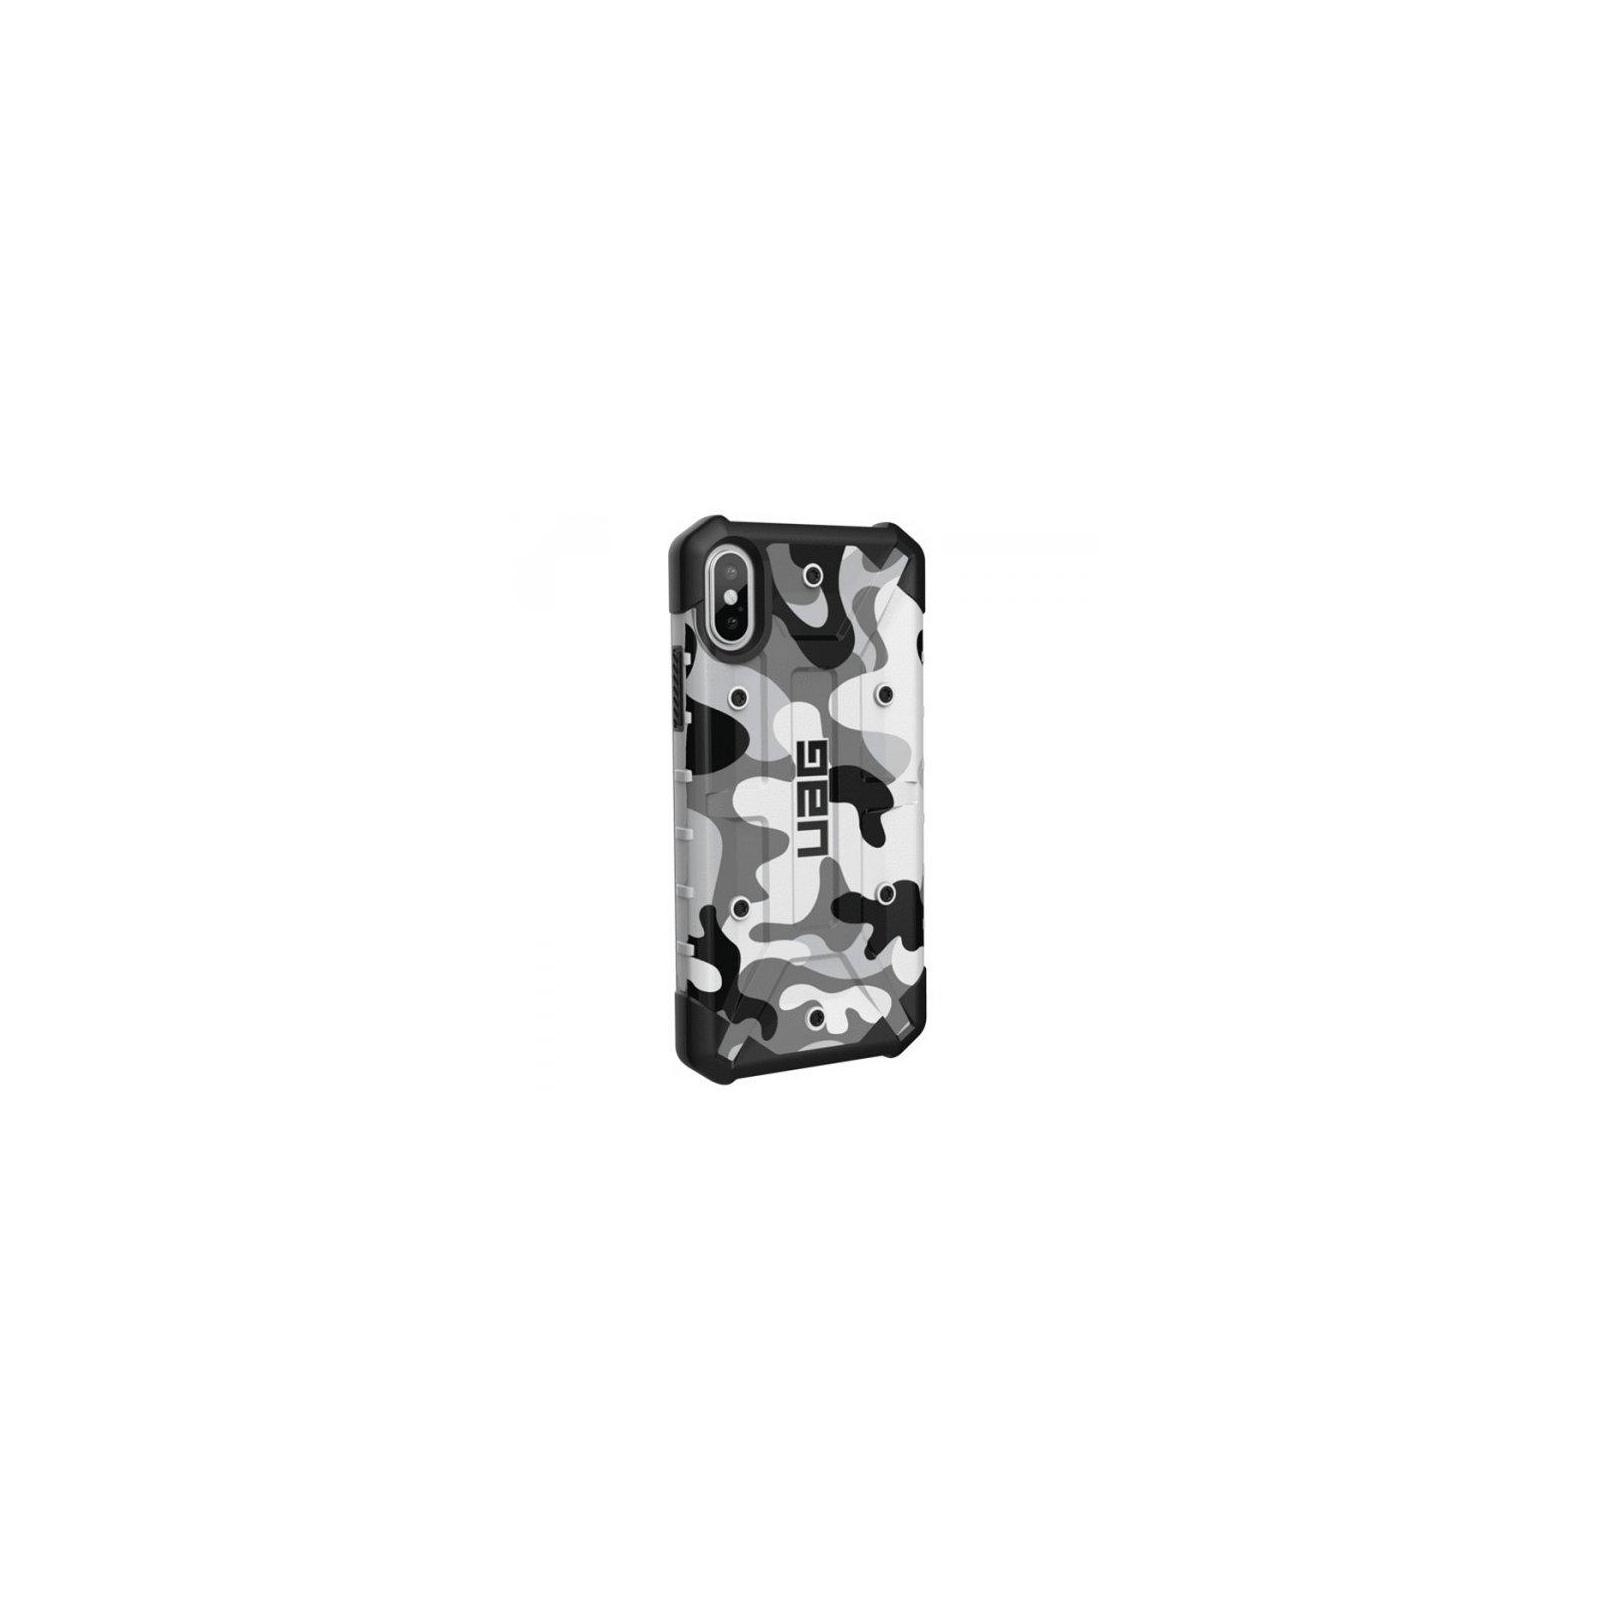 Чехол для моб. телефона UAG iPhone X Pathfinder Camo Gray/White (IPHX-A-WC) изображение 2